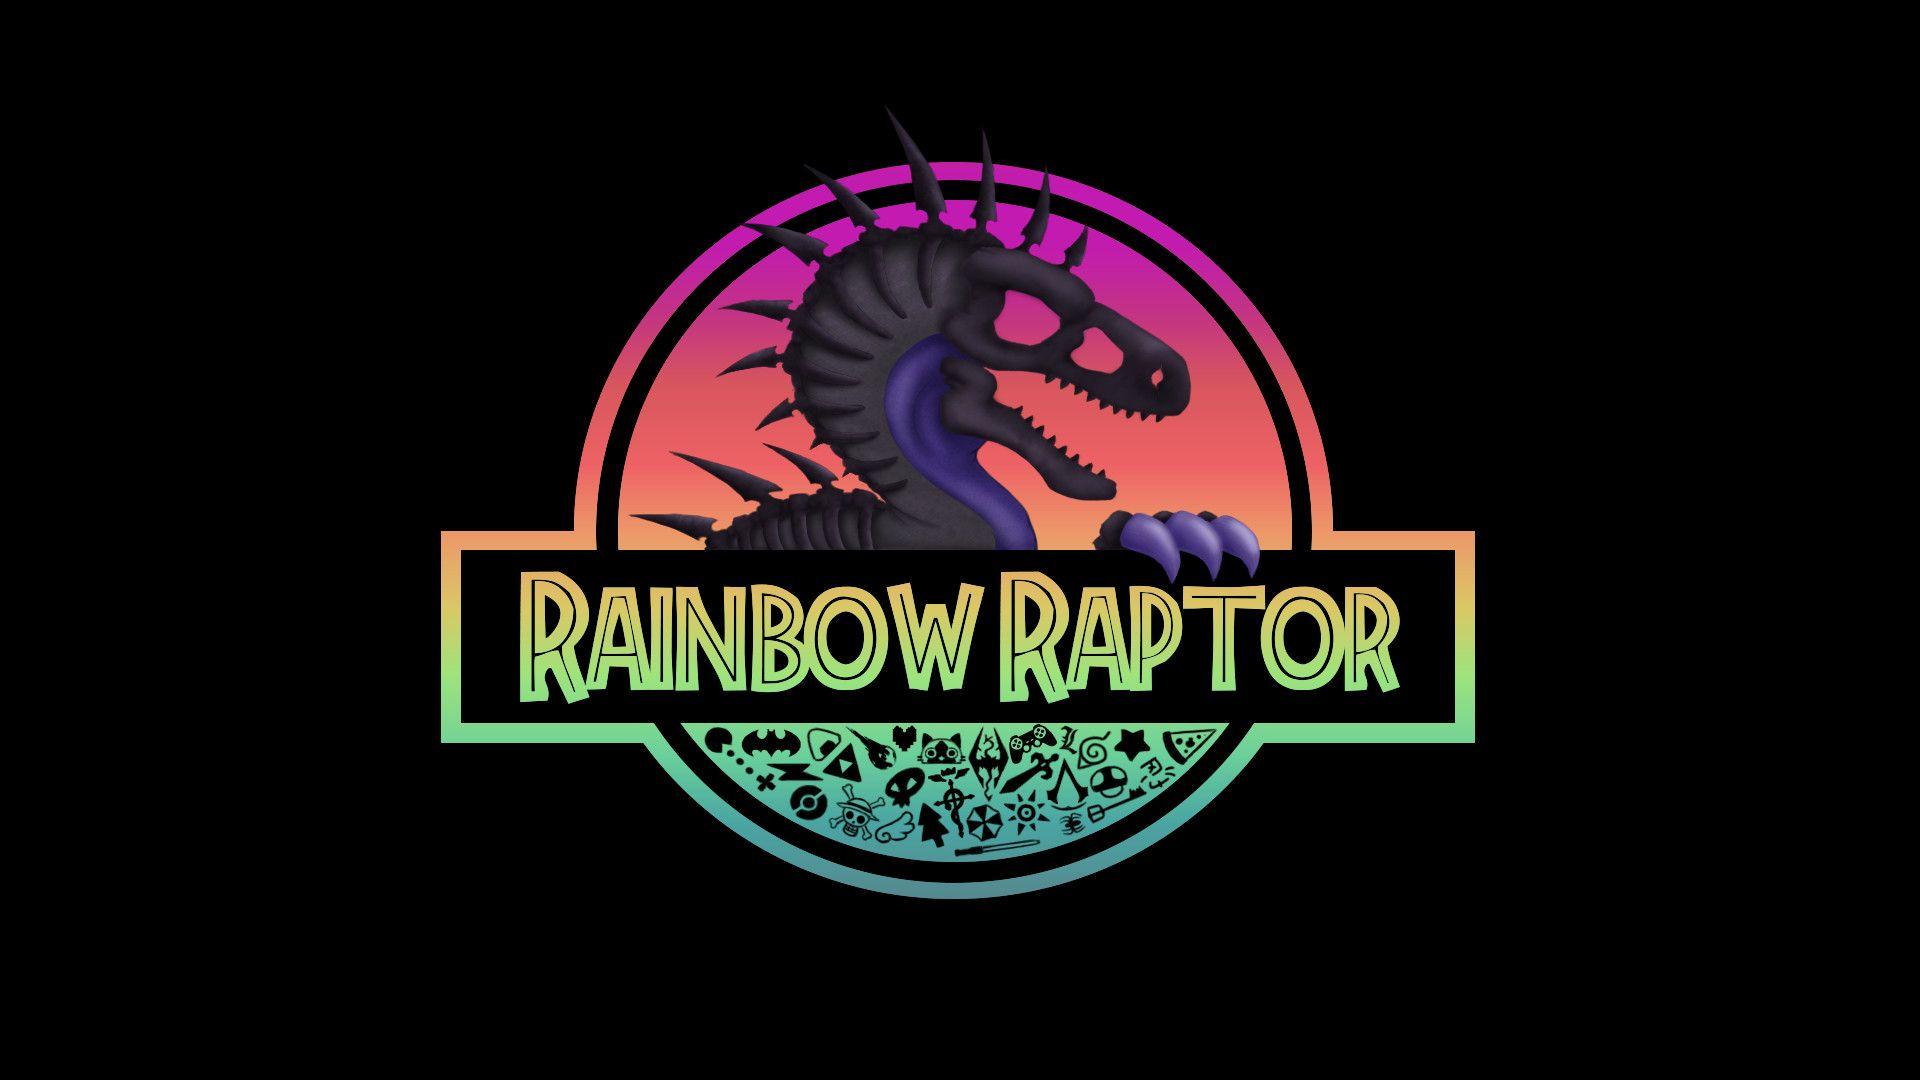 Redfox Inuzuka Rainbow Raptor Logo Jurassic Park